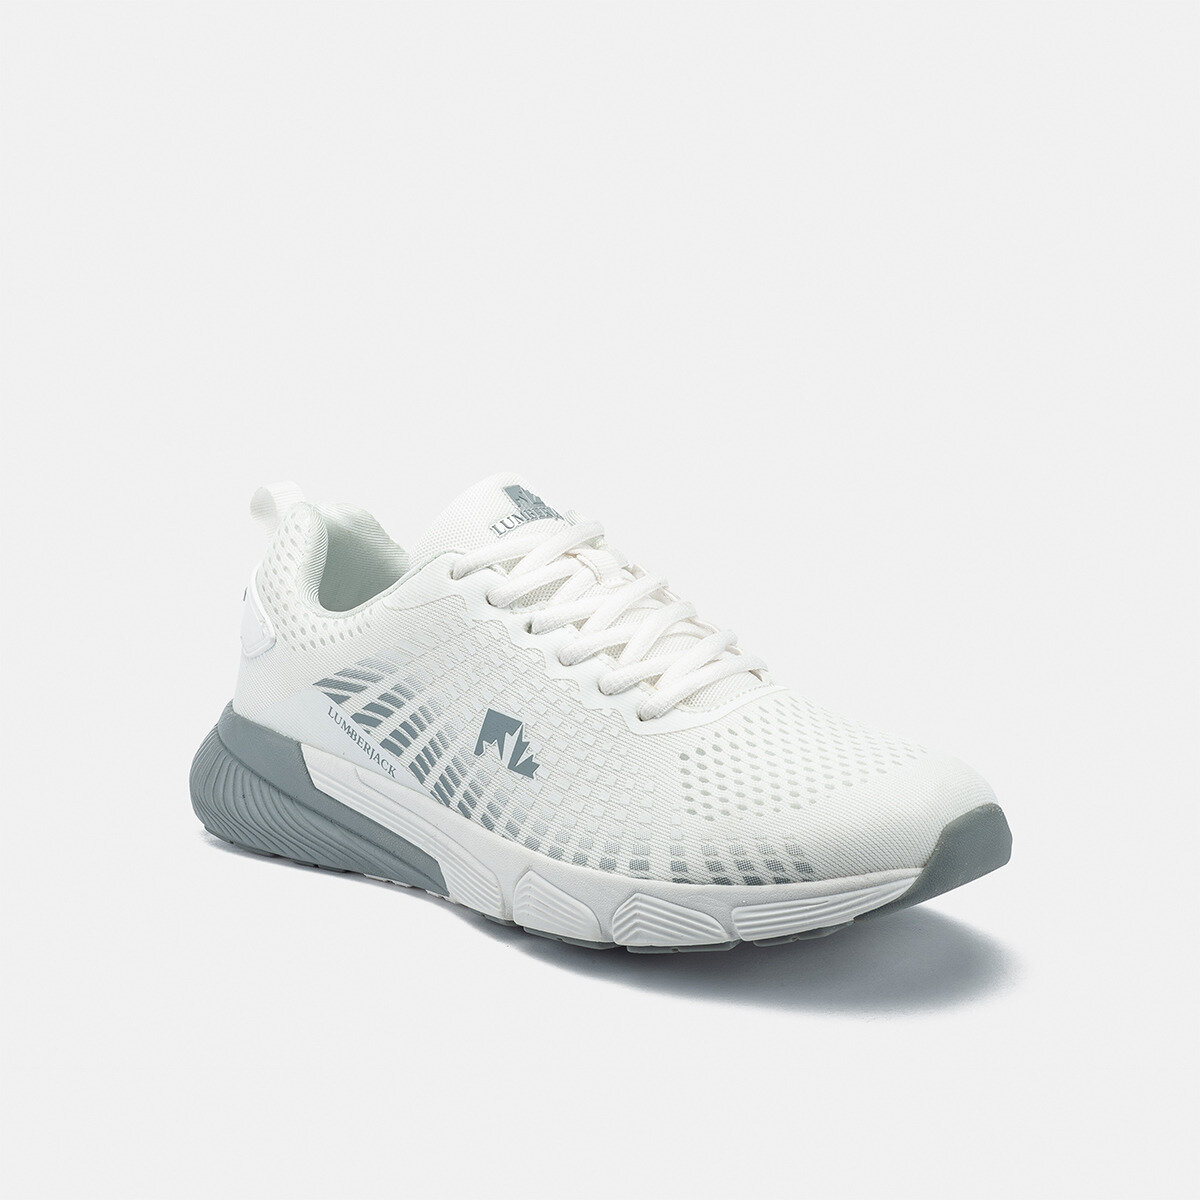 CHEN WHITE/GREY Man Running shoes